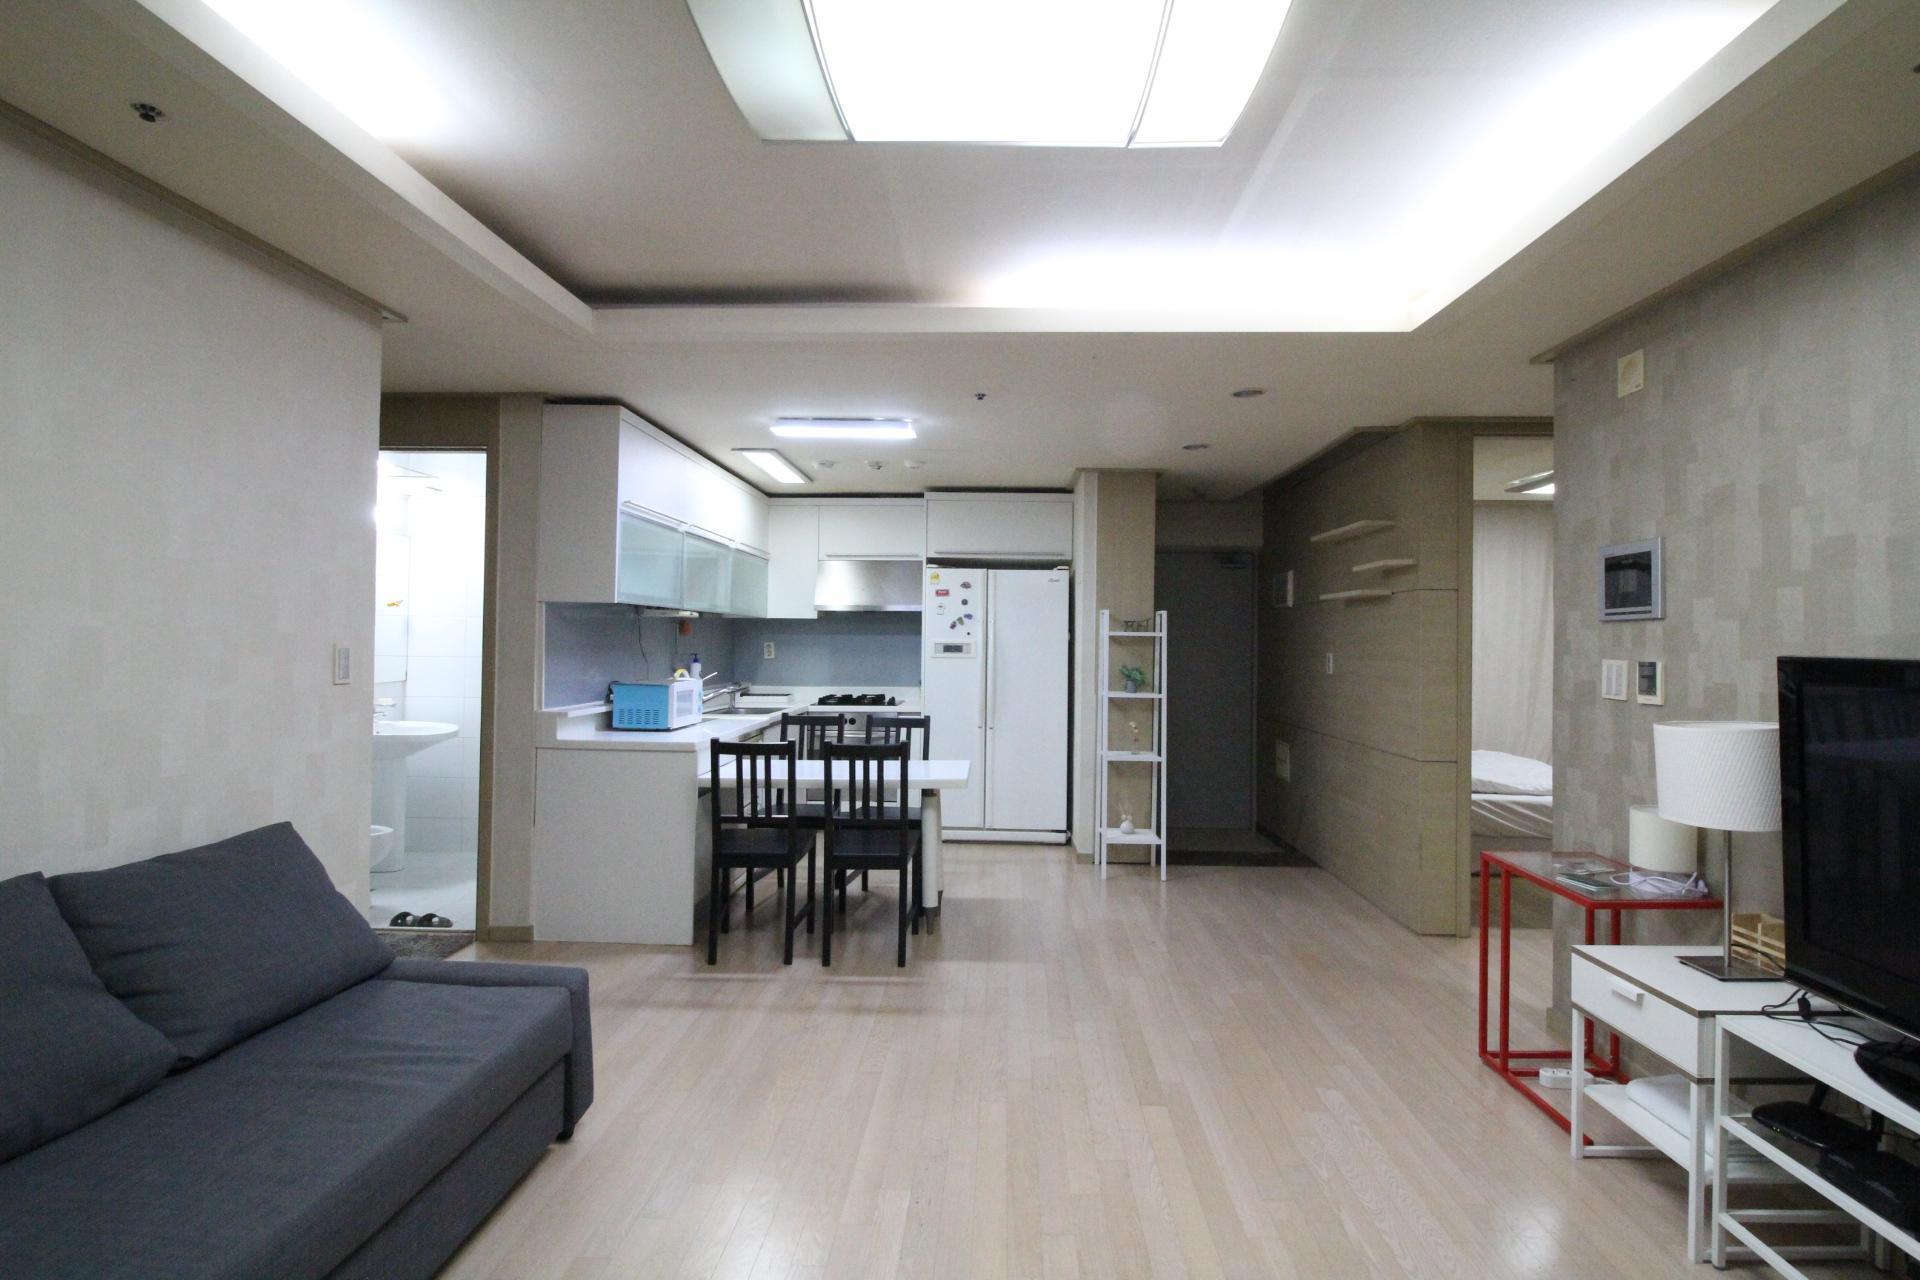 SAMSEONG2 Galleria 3BDR2BT 5MIN WALK SUBWAY